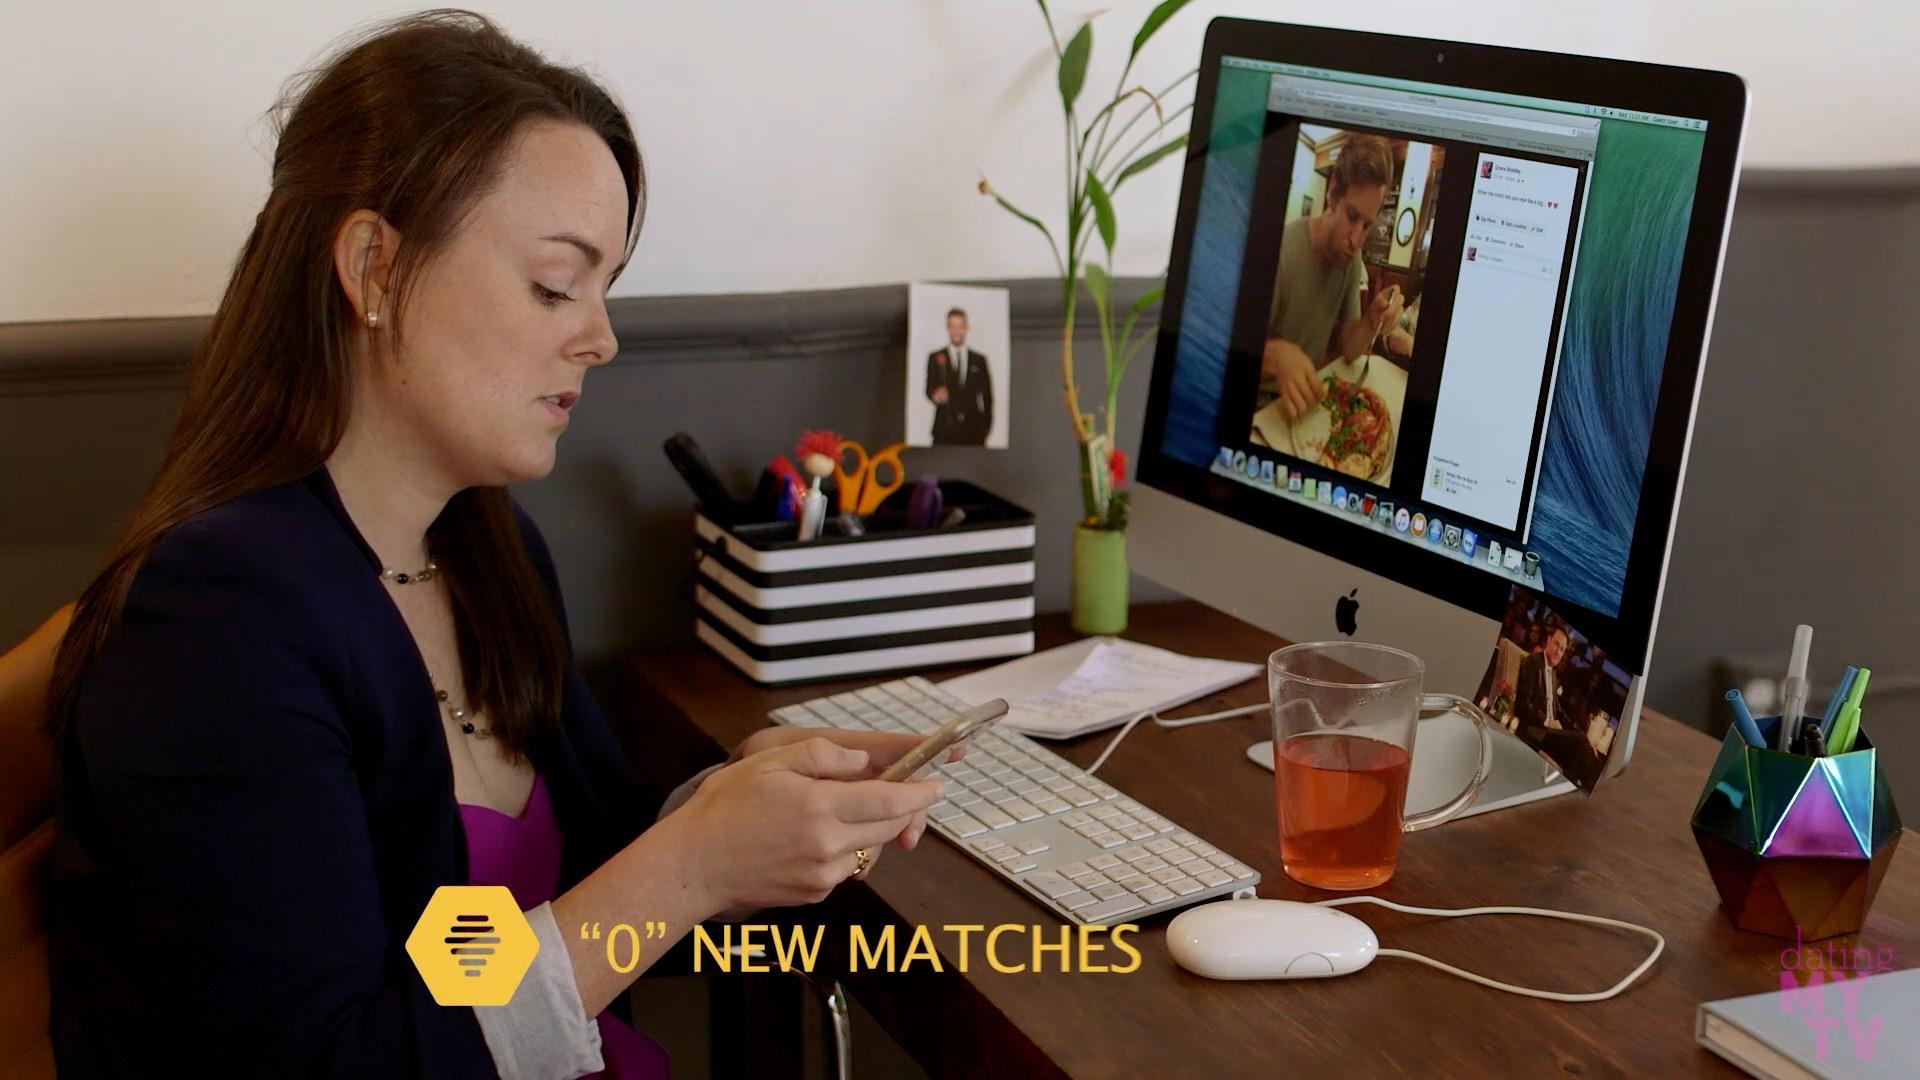 0-matches.jpg